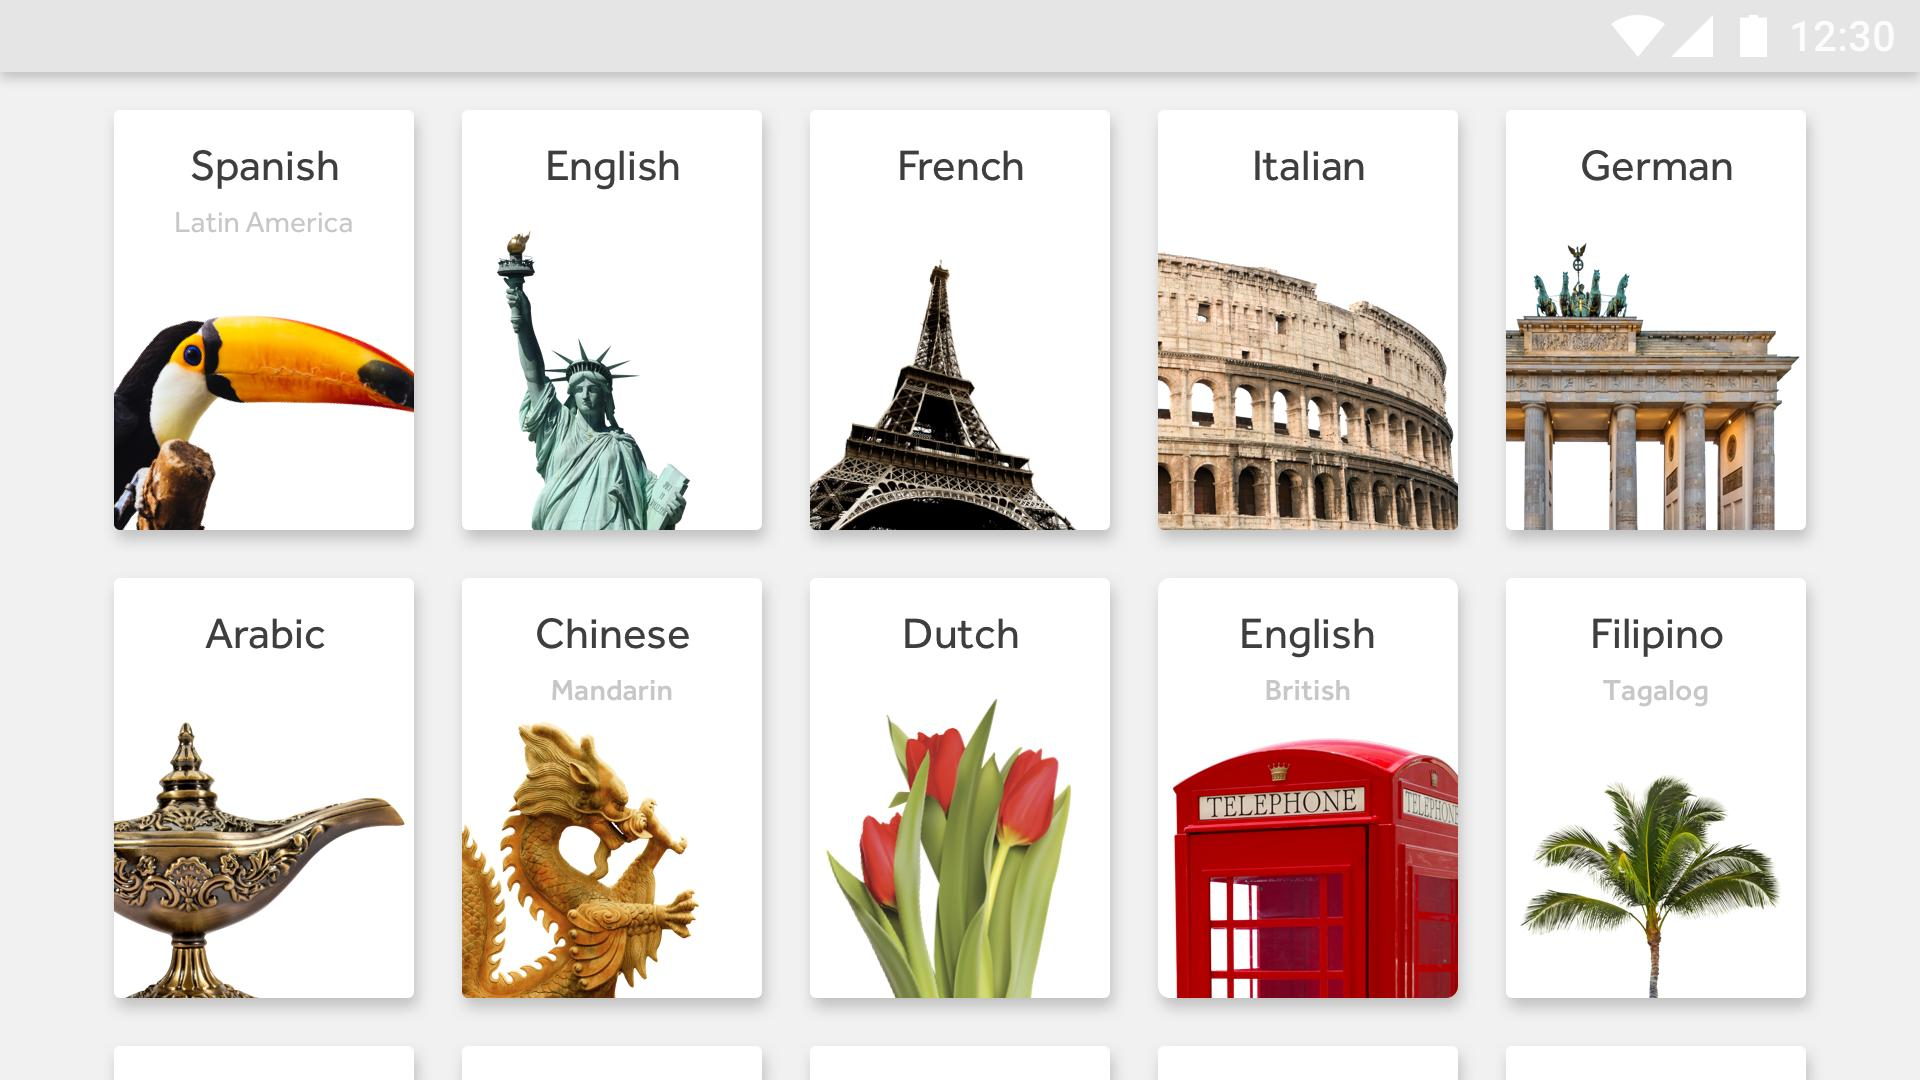 Rosetta Stone Learn Languages 5.7.2 Screenshot 6